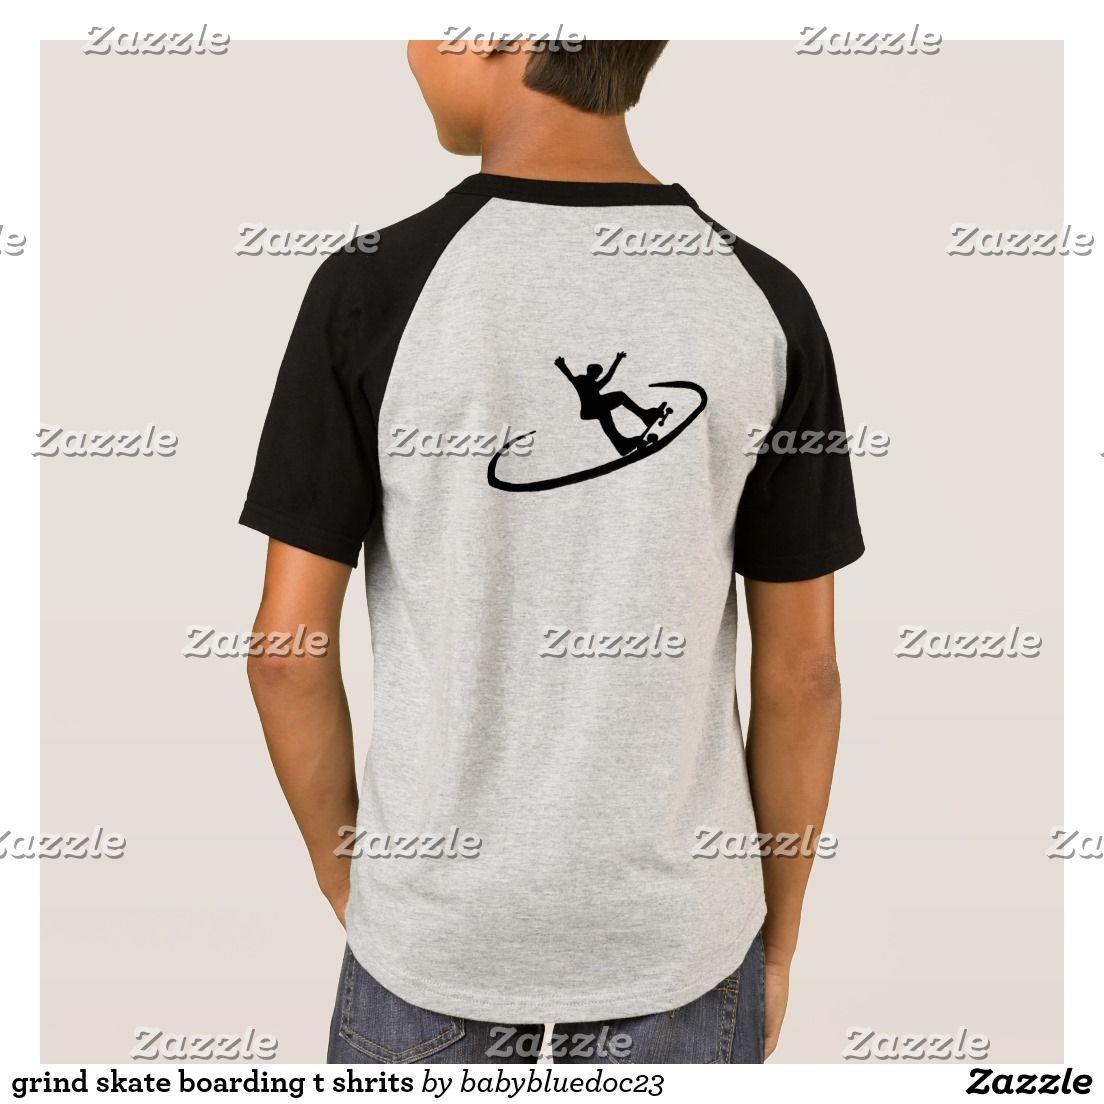 Zazzle t shirt design size - Grind Skate Boarding T Shrits T Shirt